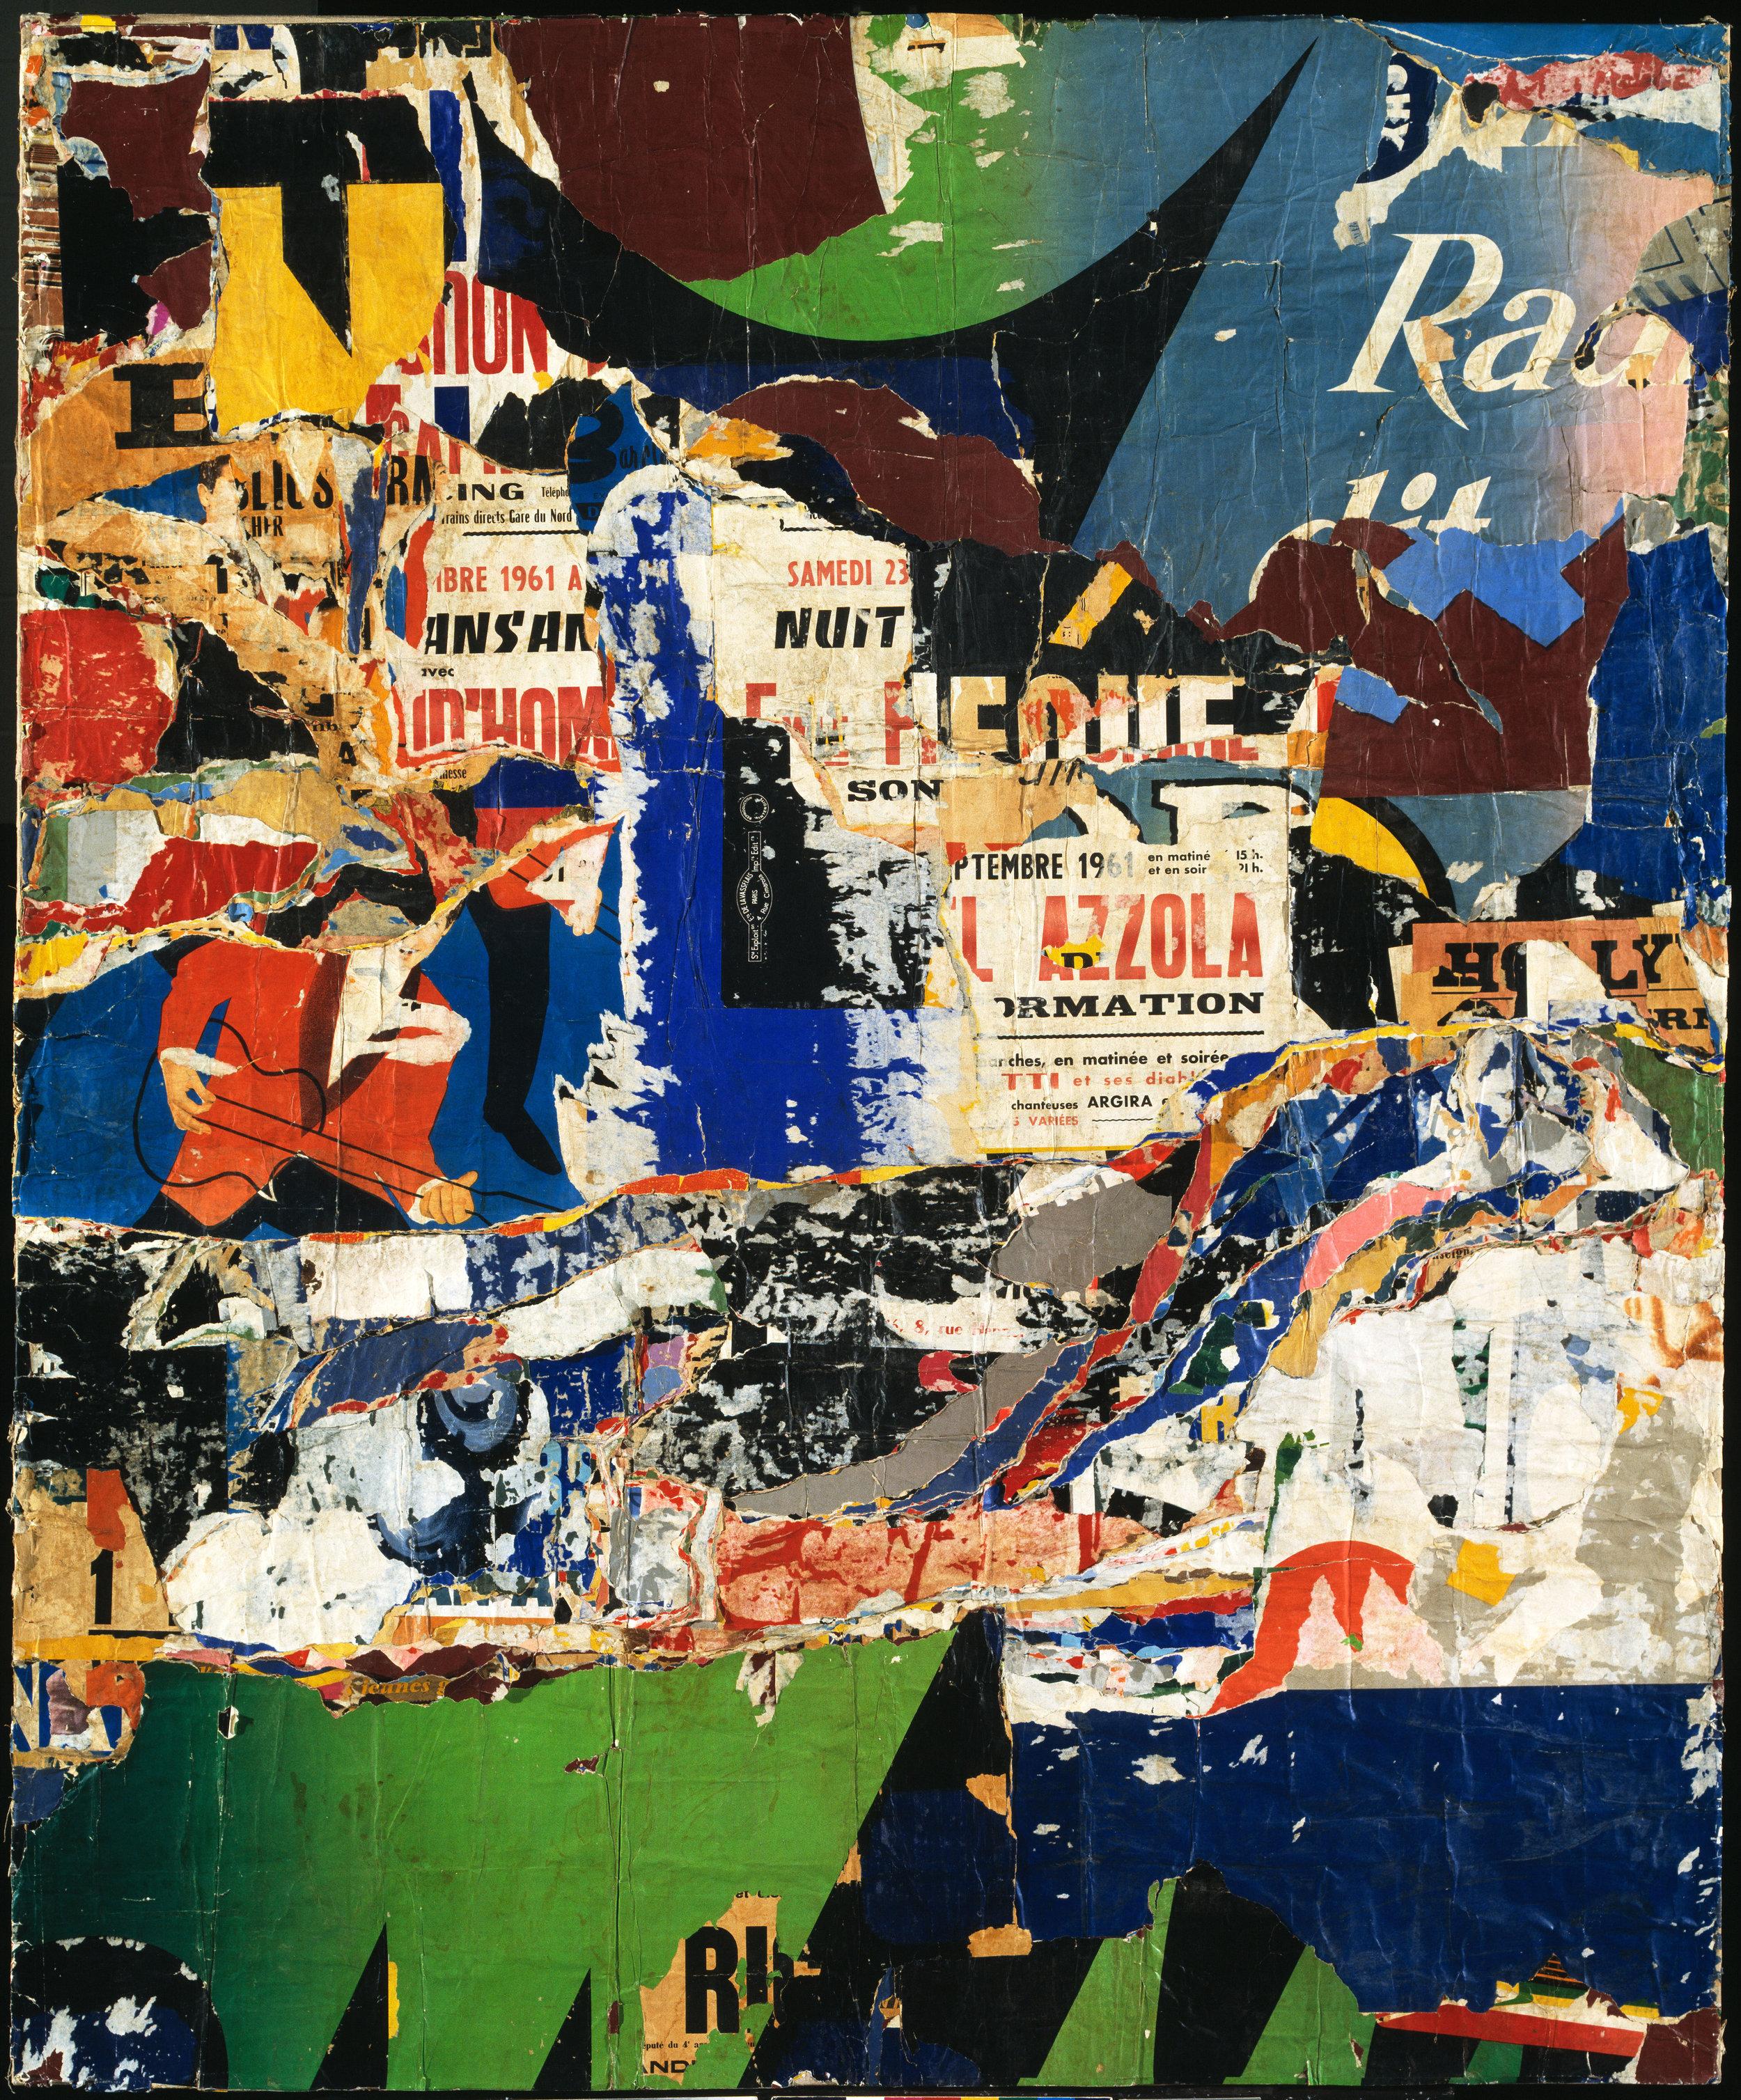 Jacques Mahé de la Villeglé,  Jazzmen (1961) Tate, Presented by the Friends of the Tate Gallery 2000 (T07619)